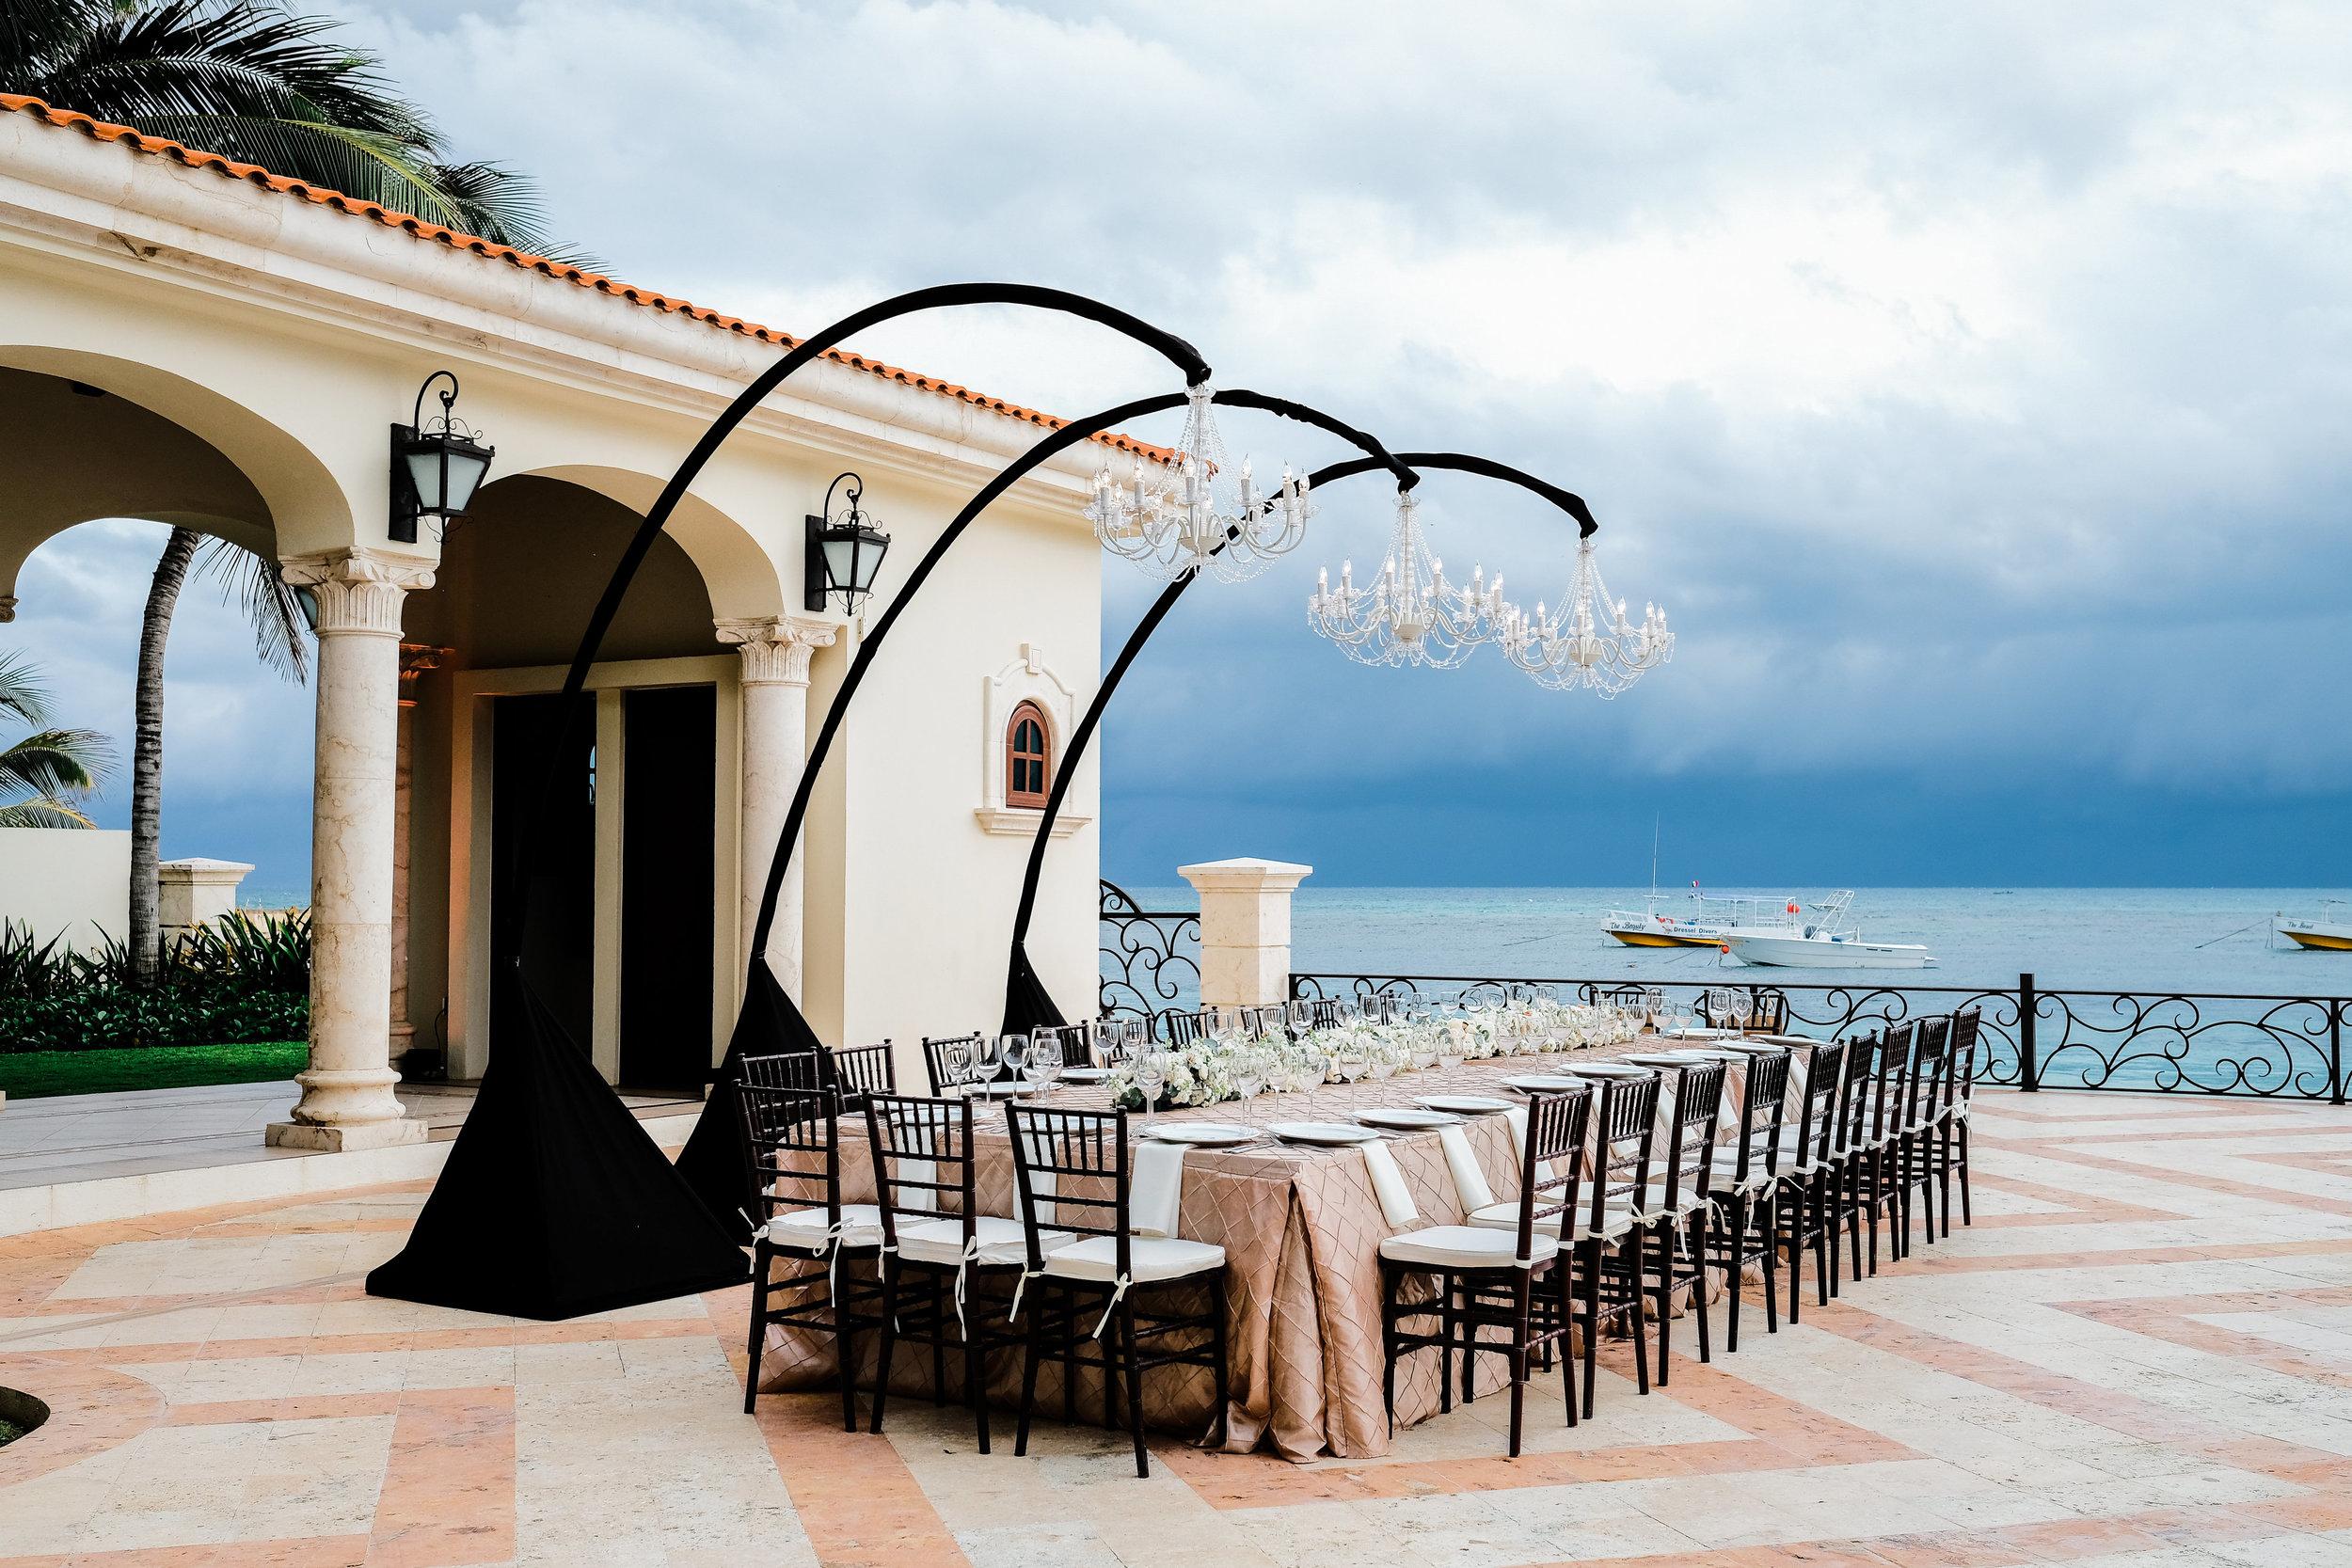 mexico_destination_wedding_villa_la_joya_cancun_57.jpg